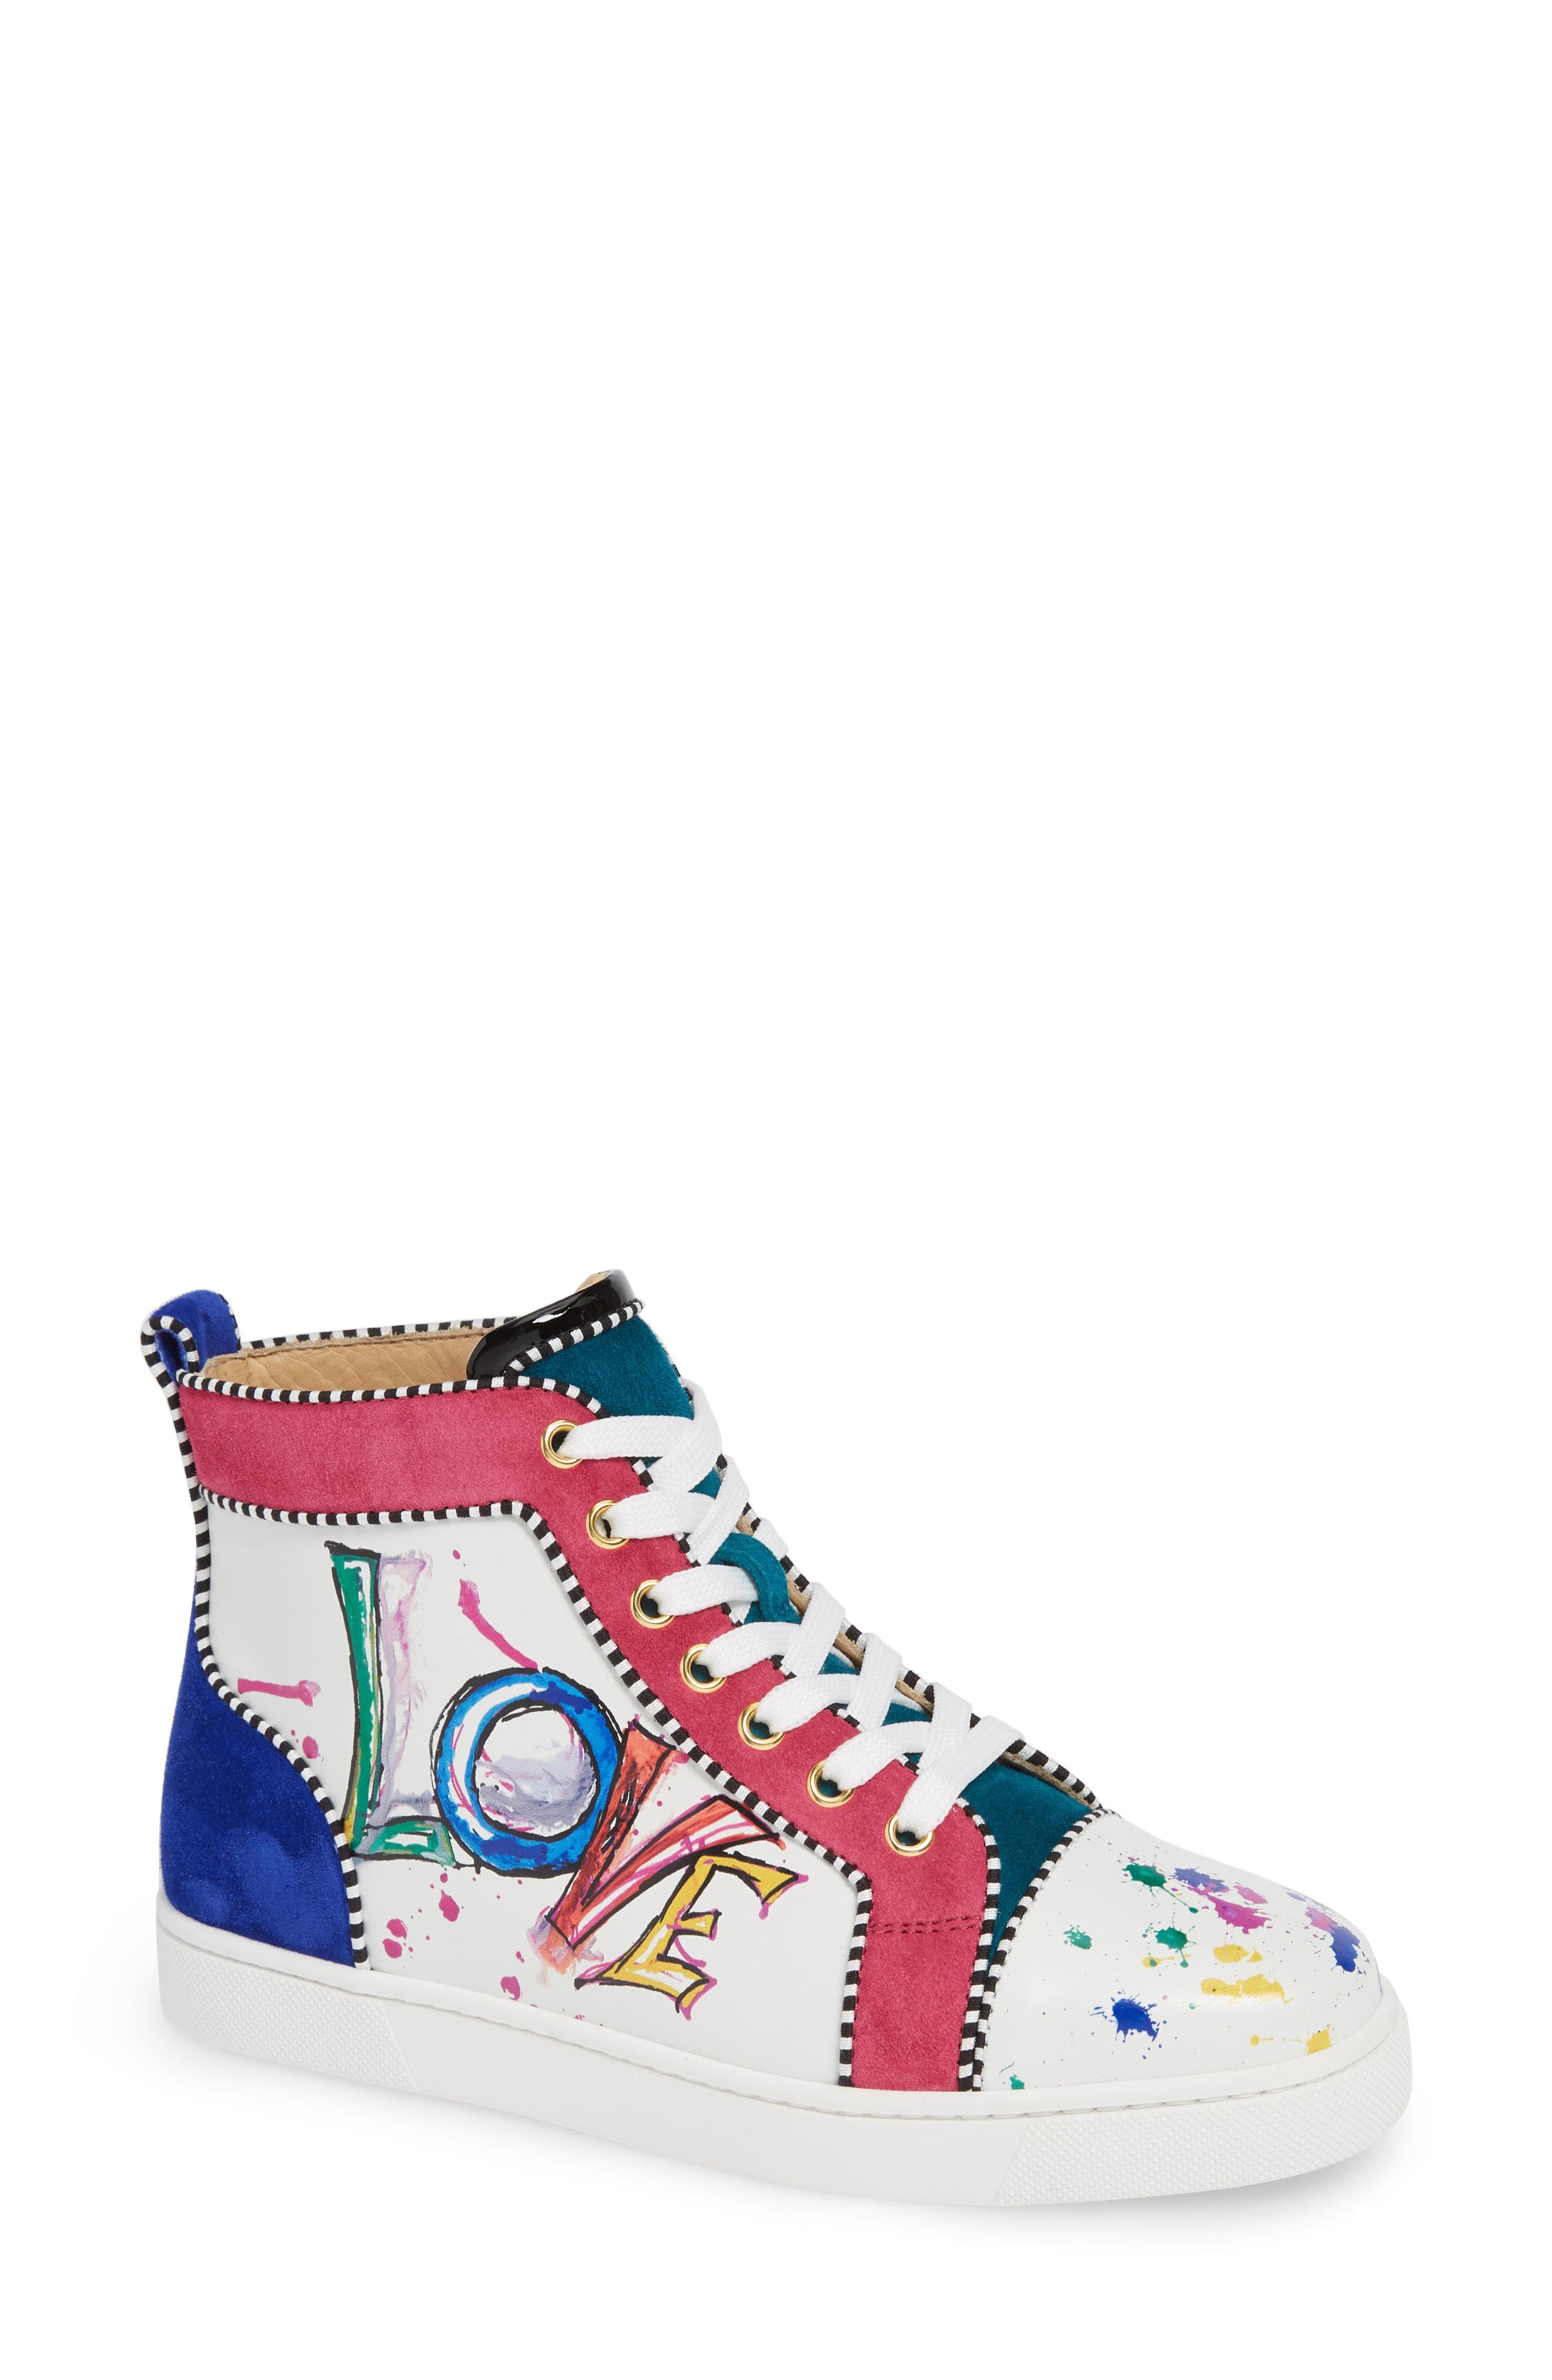 Christian Louboutin Love High Top Sneaker (Women)